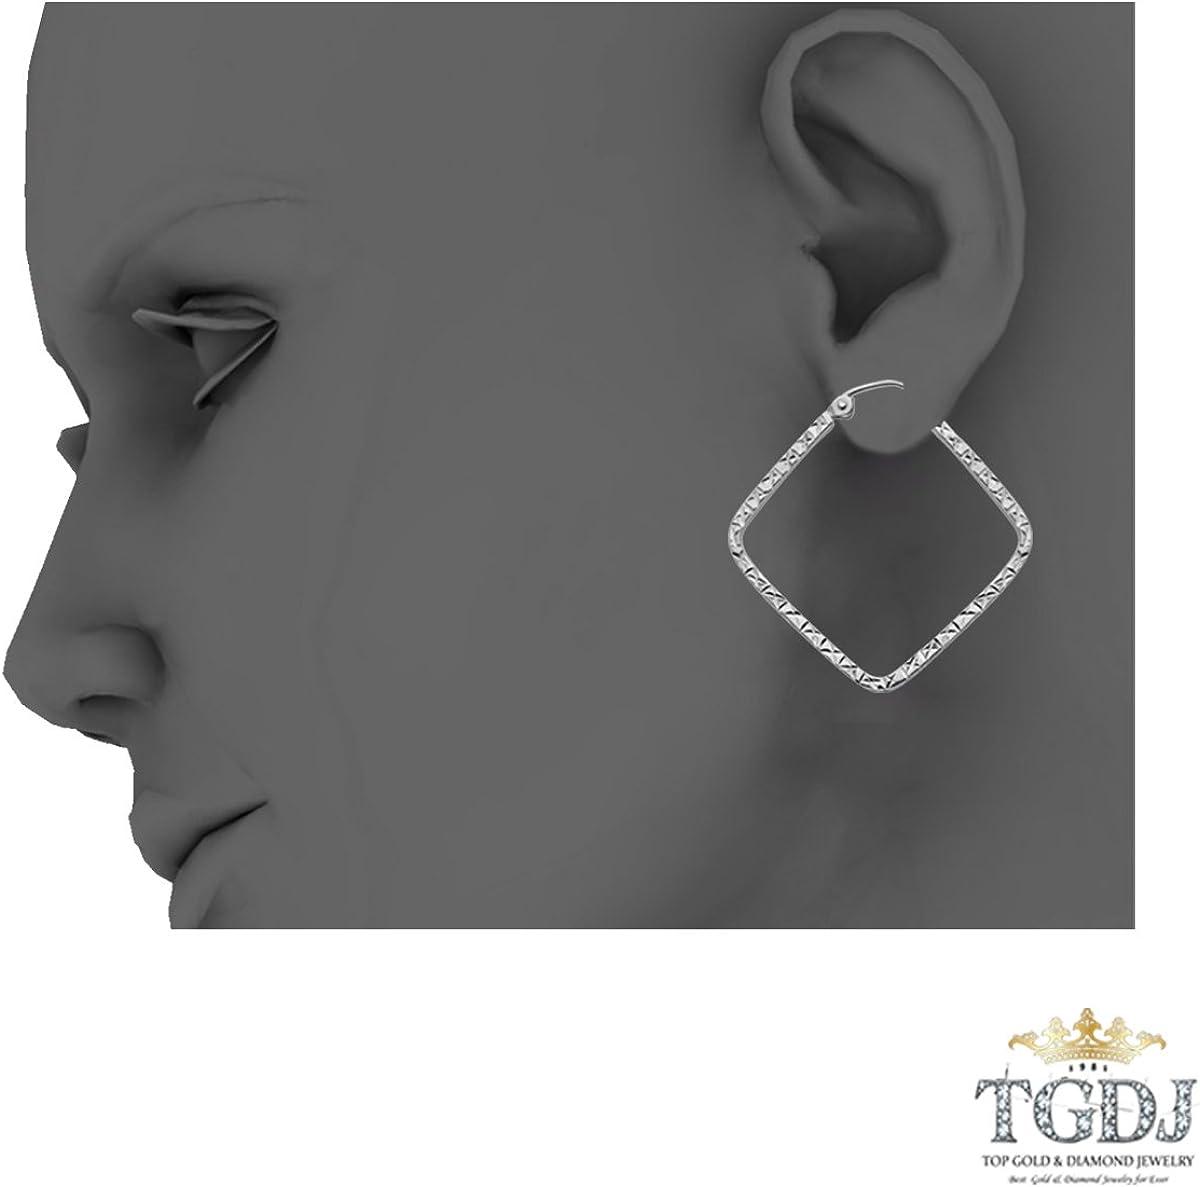 Diameter - 25mm TGDJ 14K White Gold 1.5mm Square Tube Diamond Cut Square Hoop Earrings